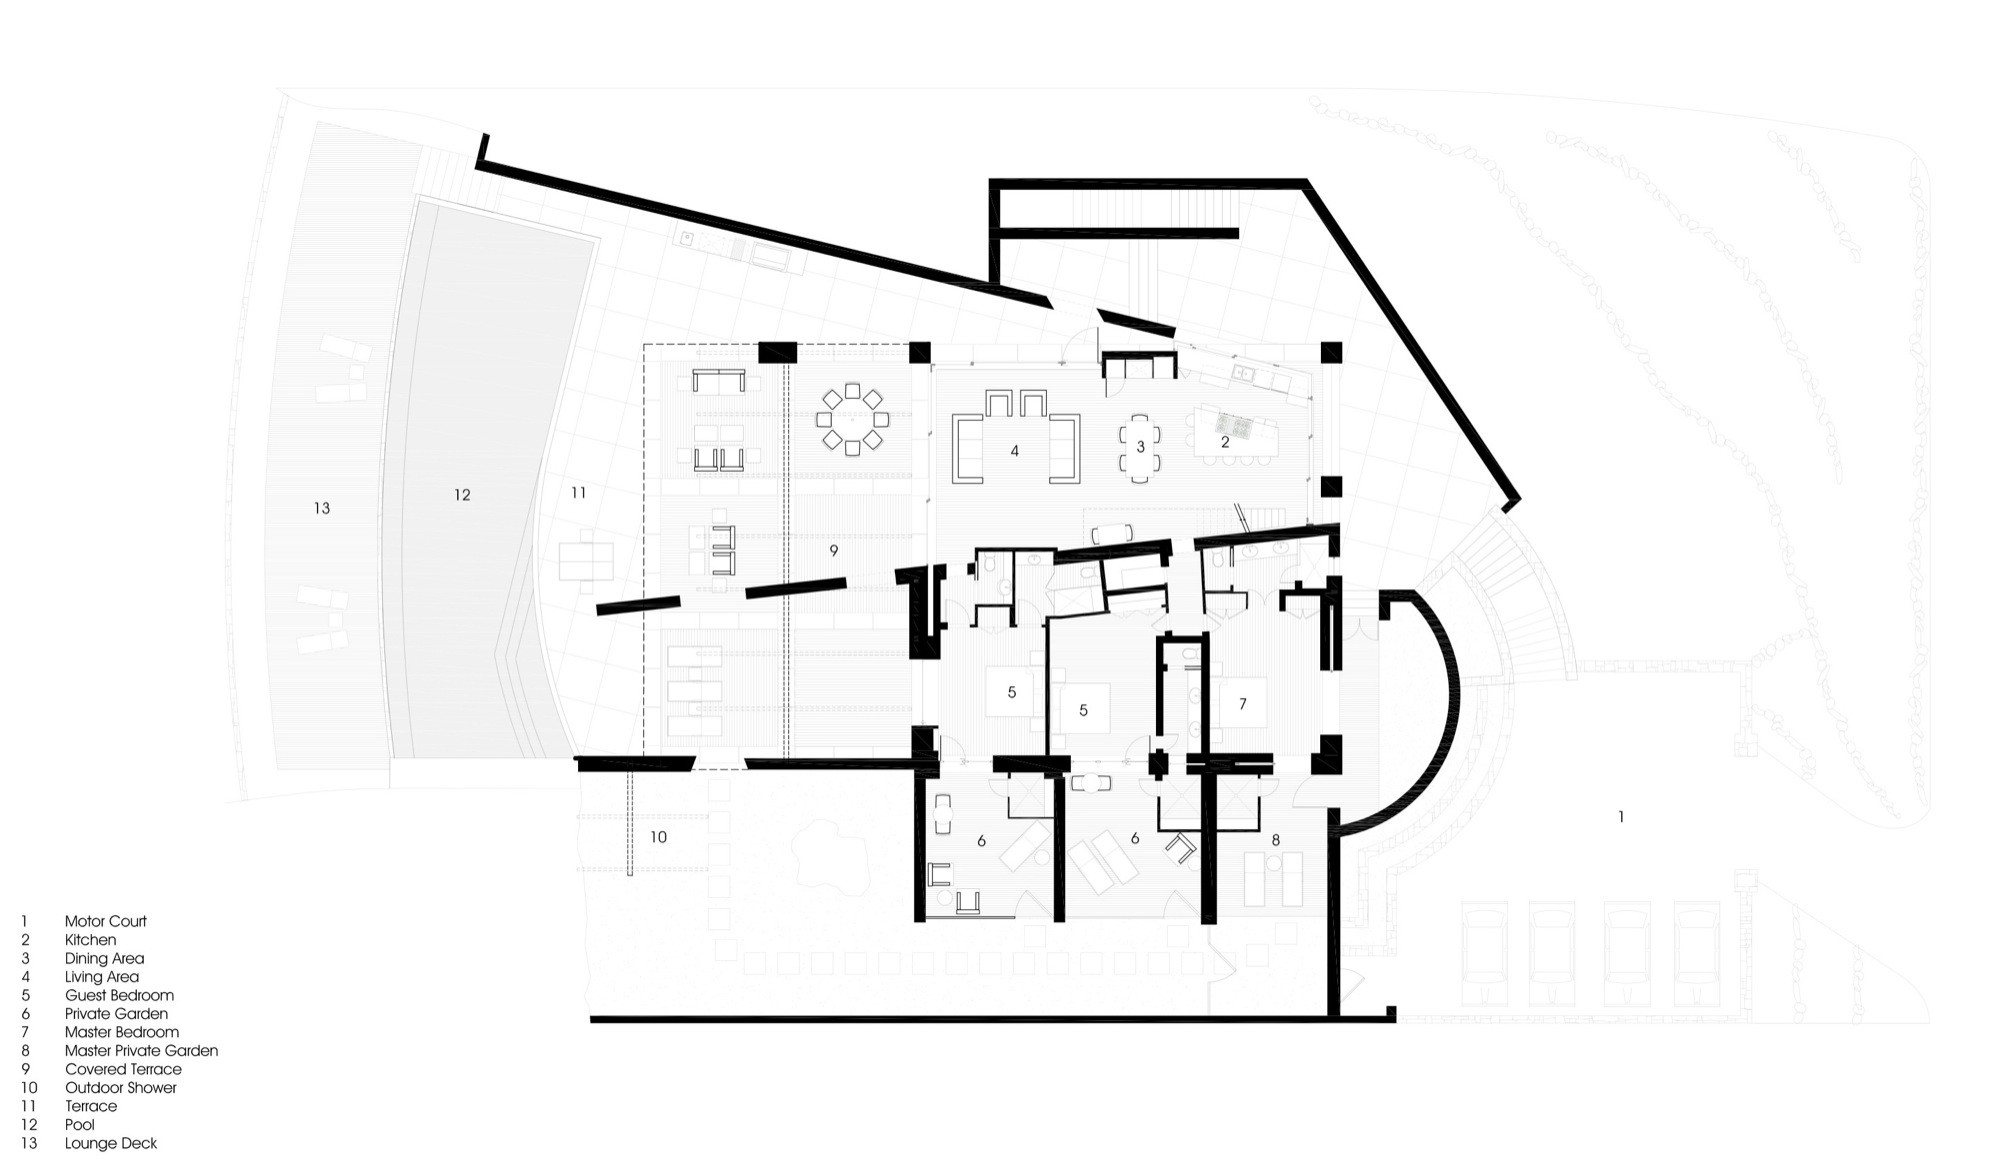 St. Barts Residence,Plan